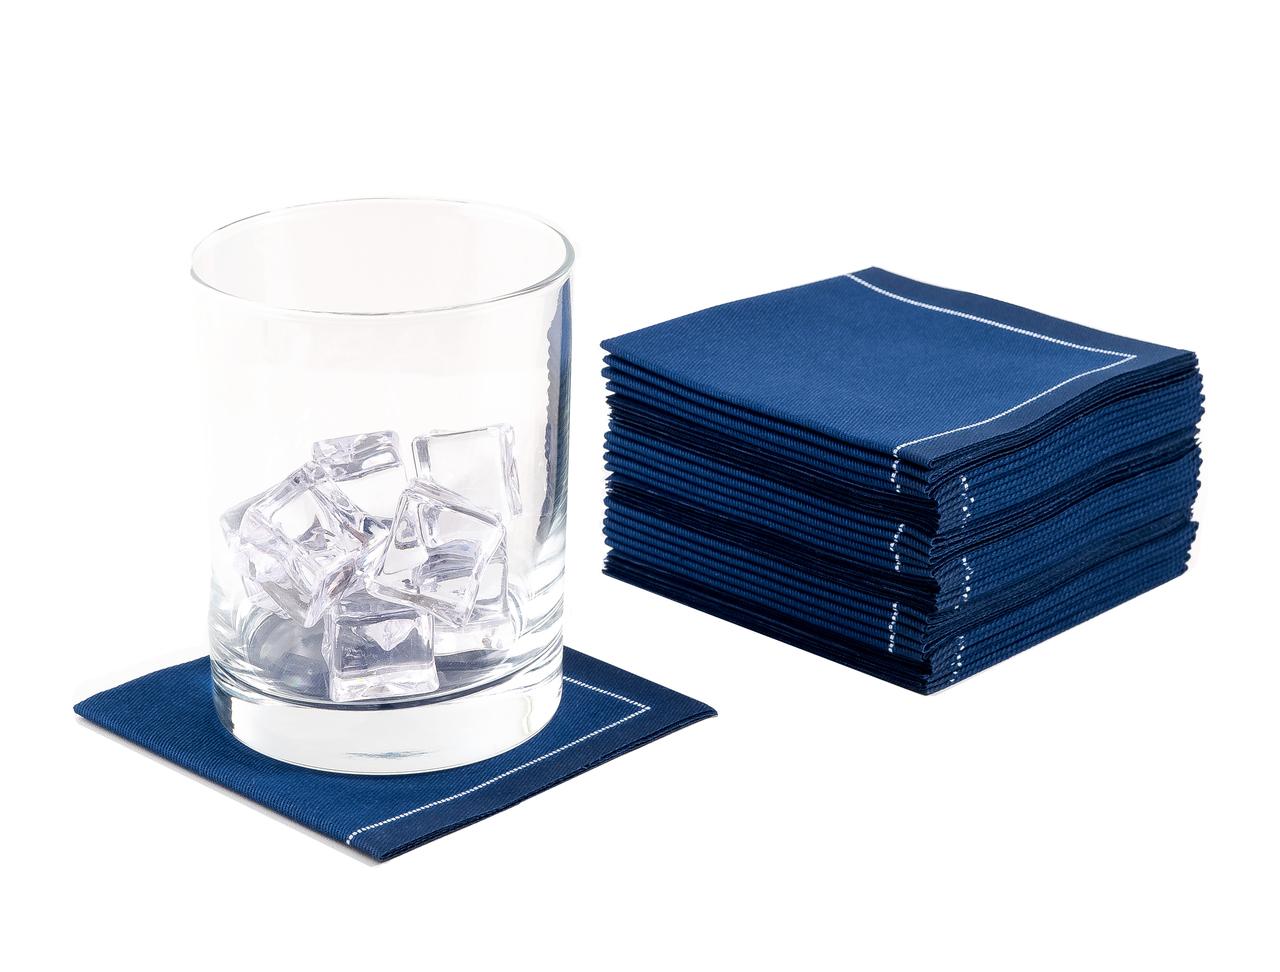 "Midnight Blue 1/4 Fold Cocktail Premium (200 GSM) - 8"" x 8"" (folded 4"" x 4"") - 600 units"